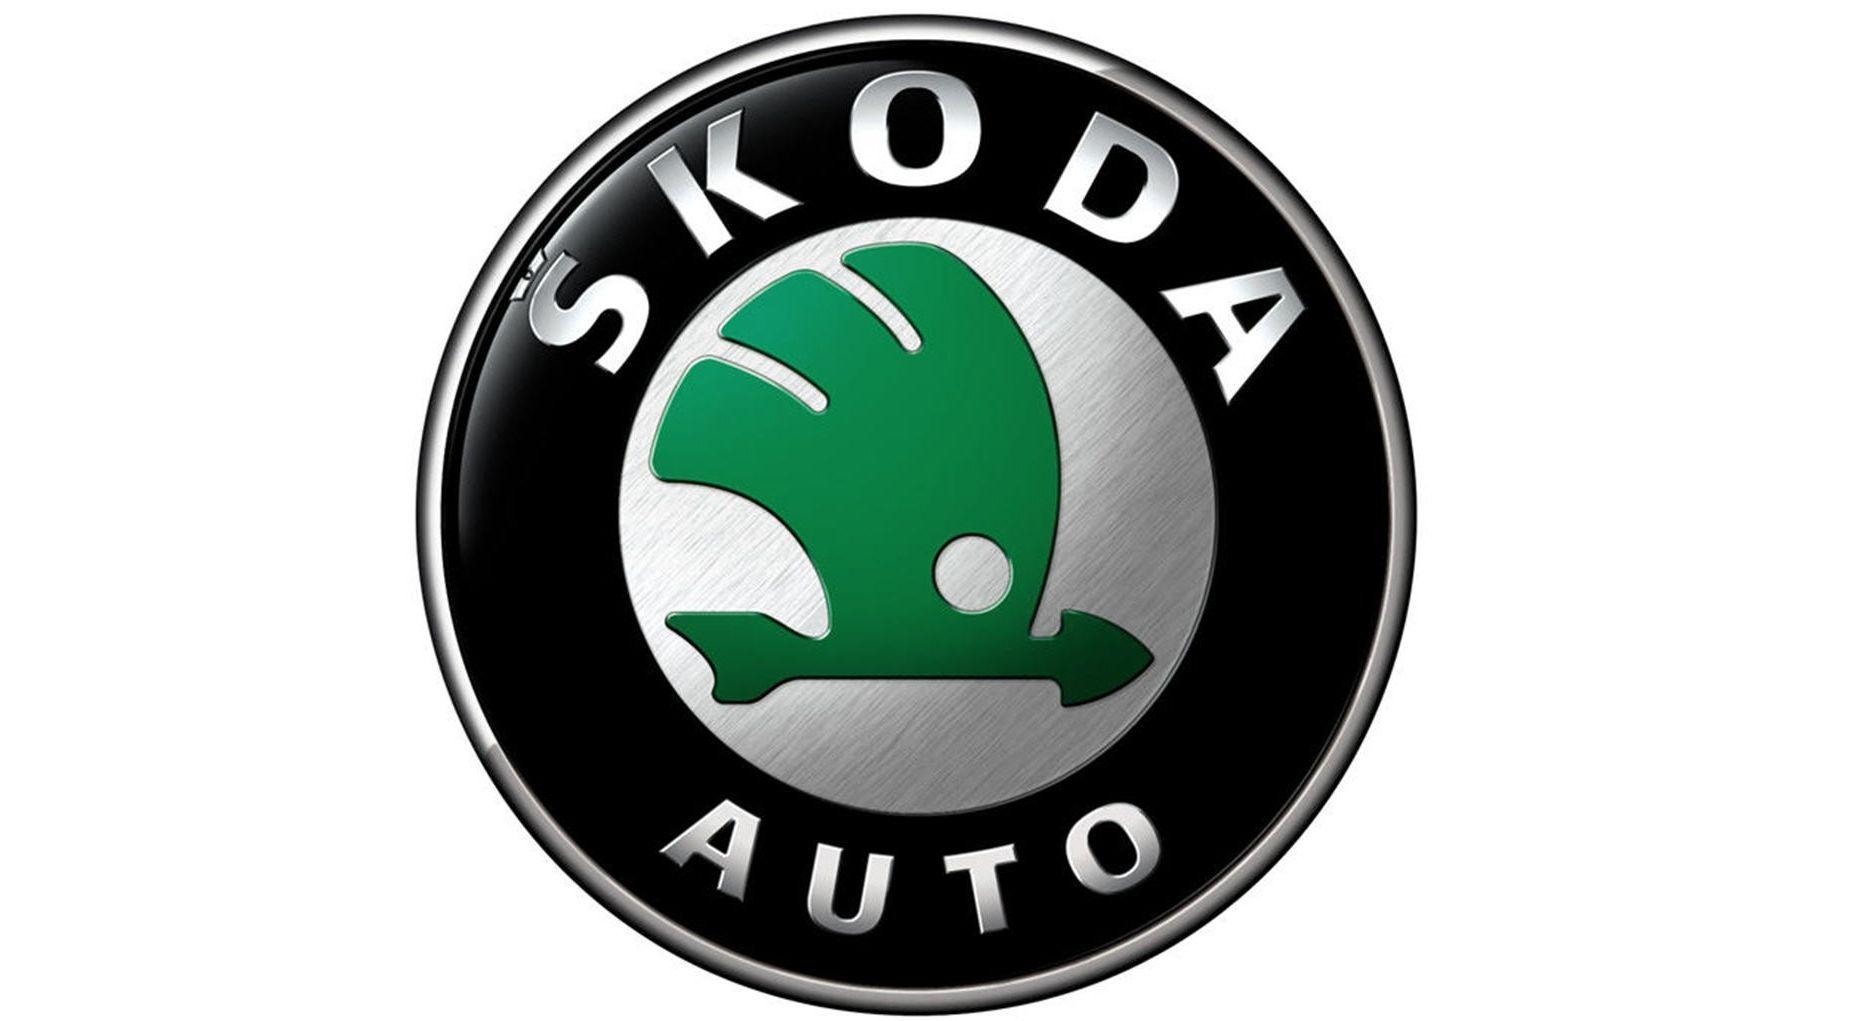 Skoda logo wallpapers HD